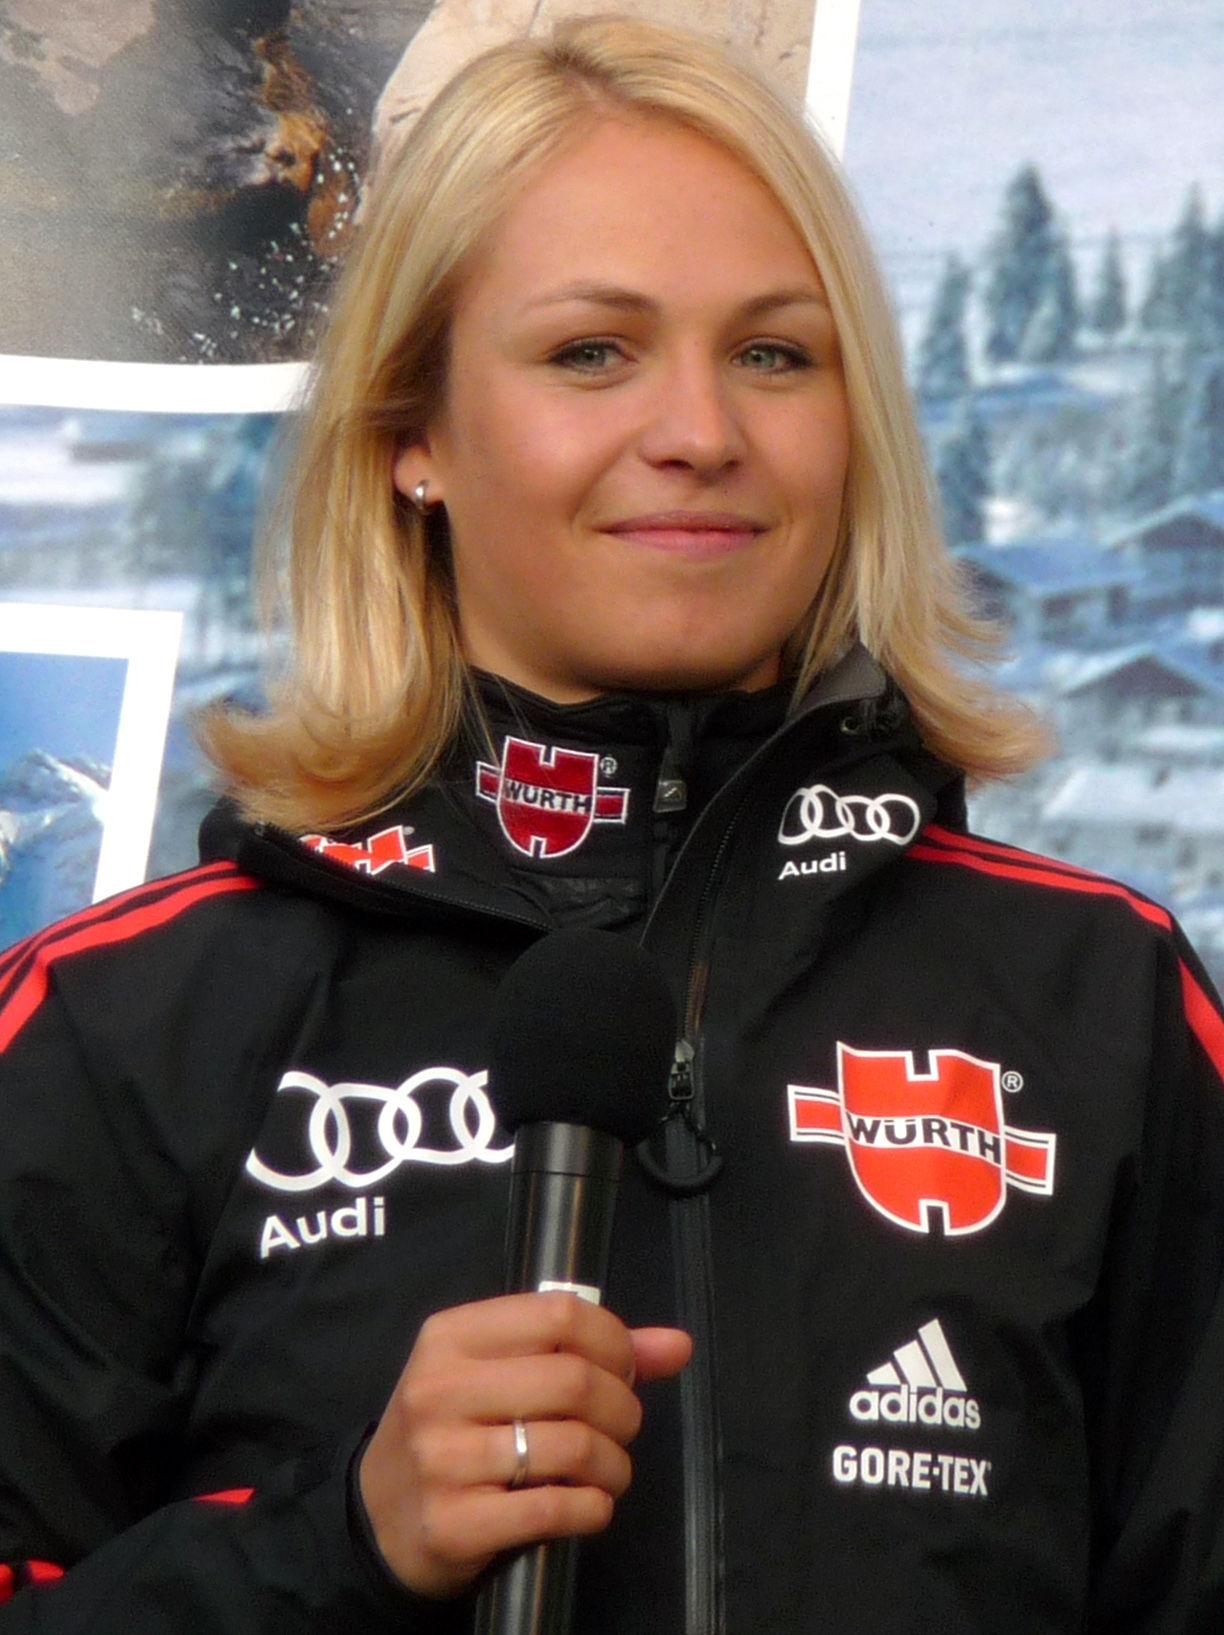 Photo of Magdalena Neuner: German biathlete